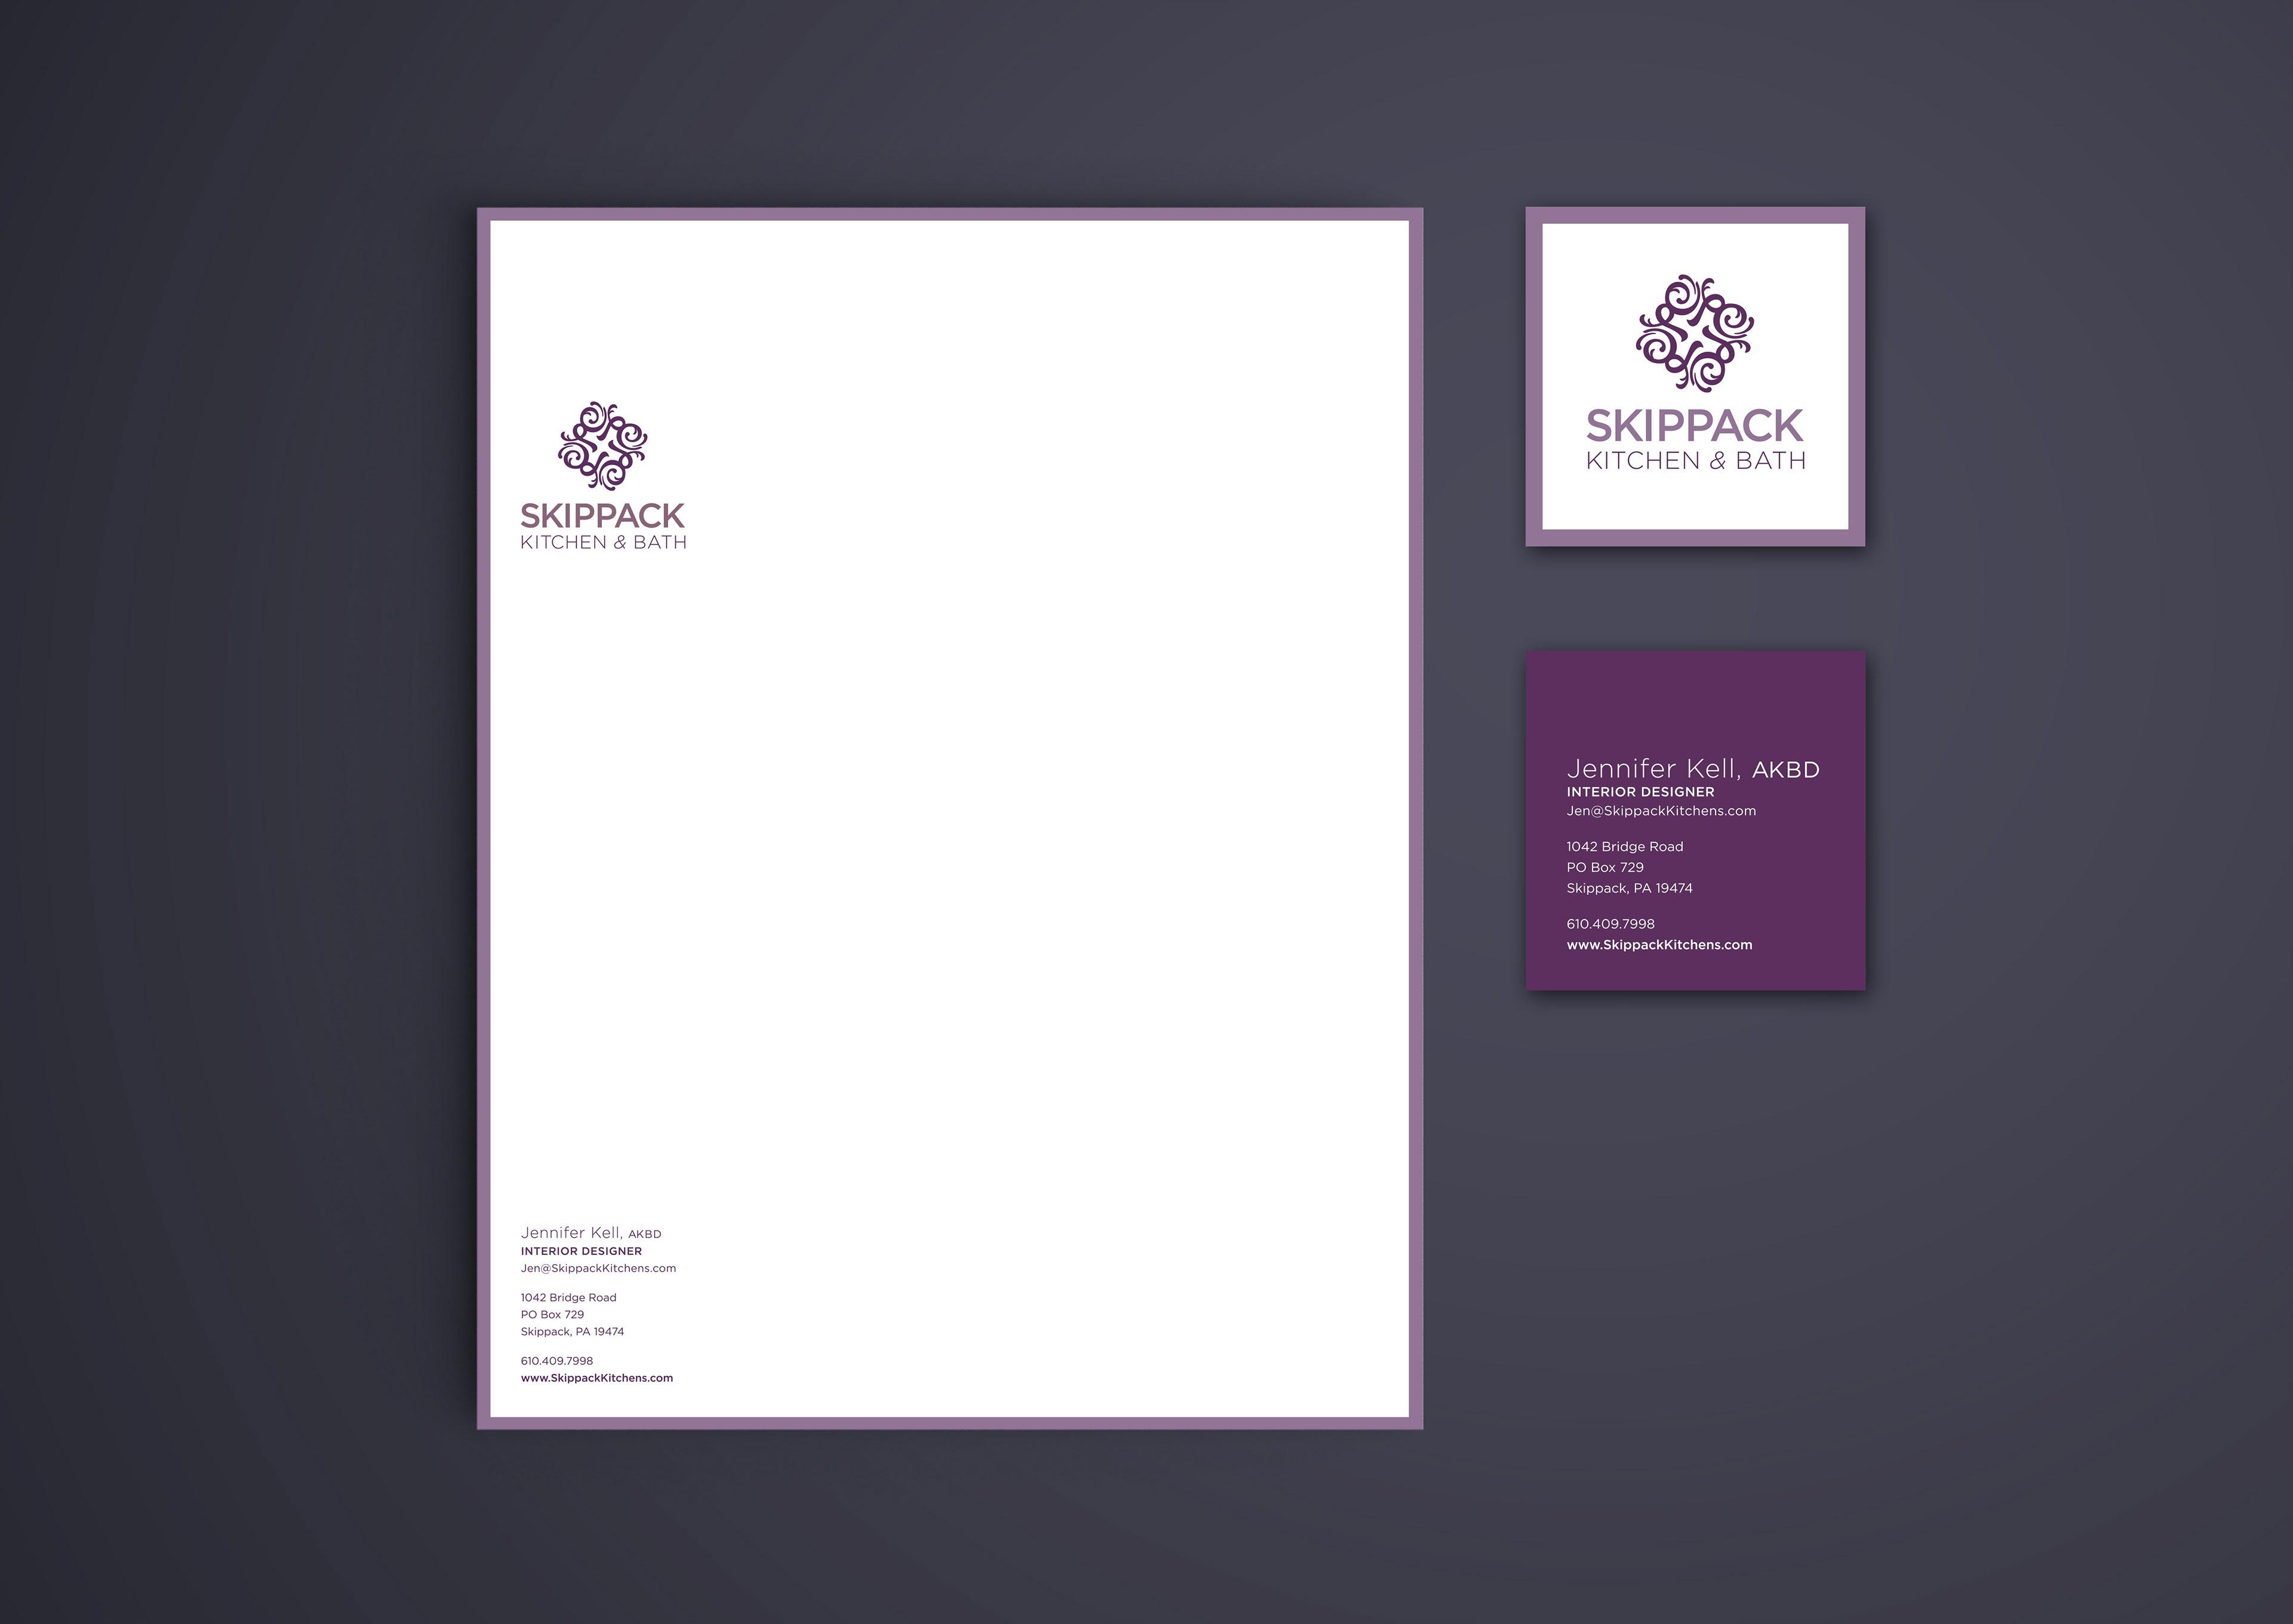 Komprehensive Design - Skippack Kitchen & Bath Identity